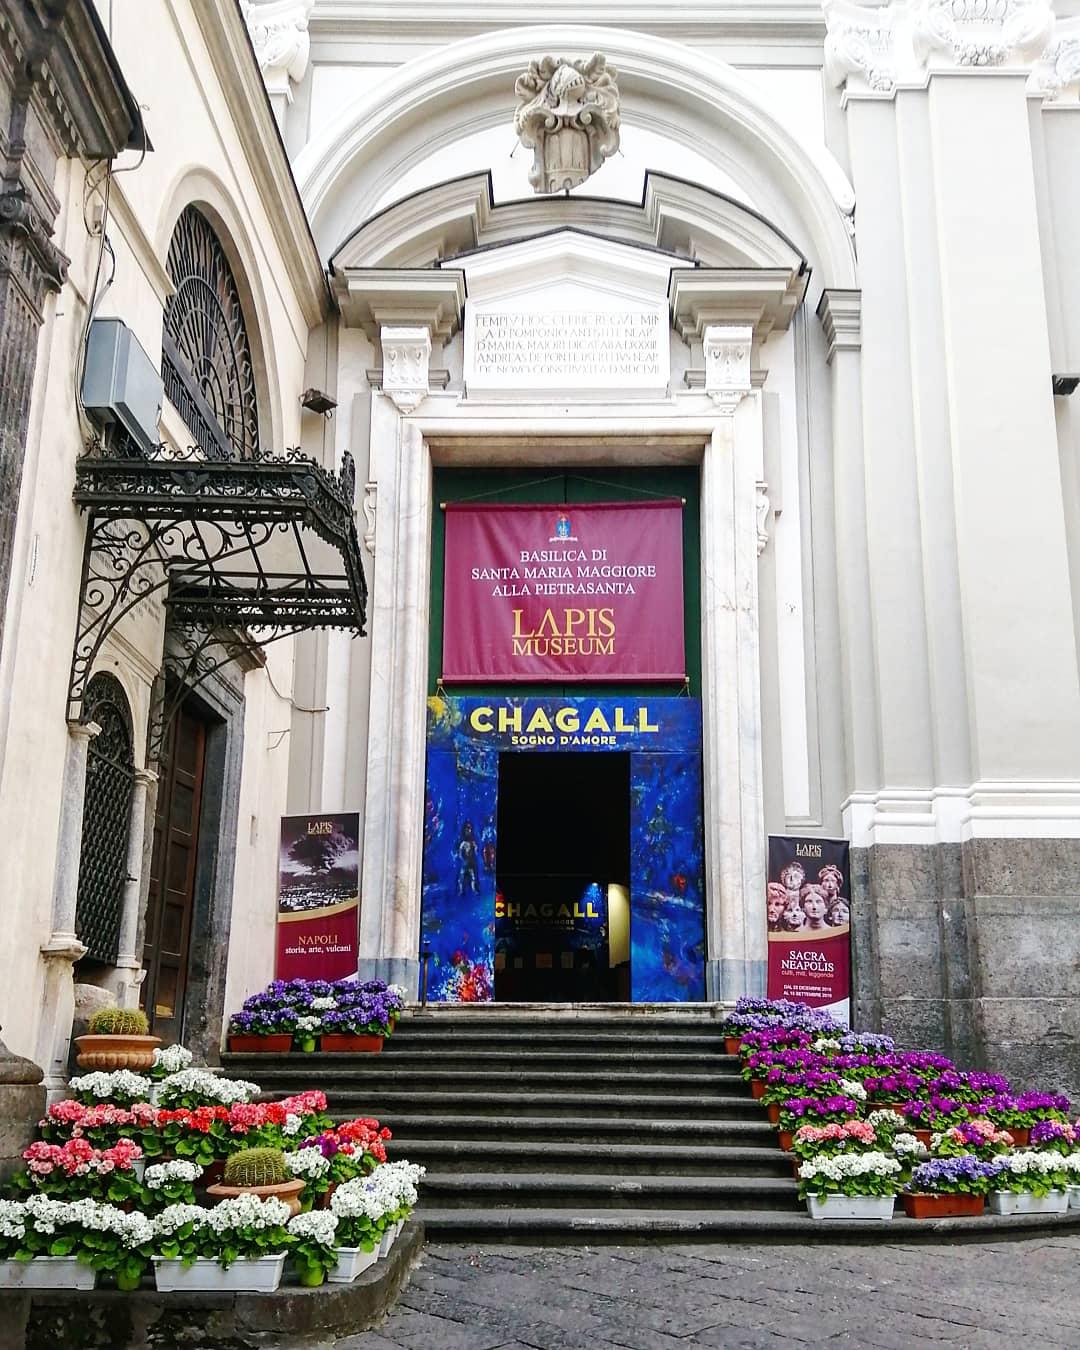 Chagall_pietrasanta